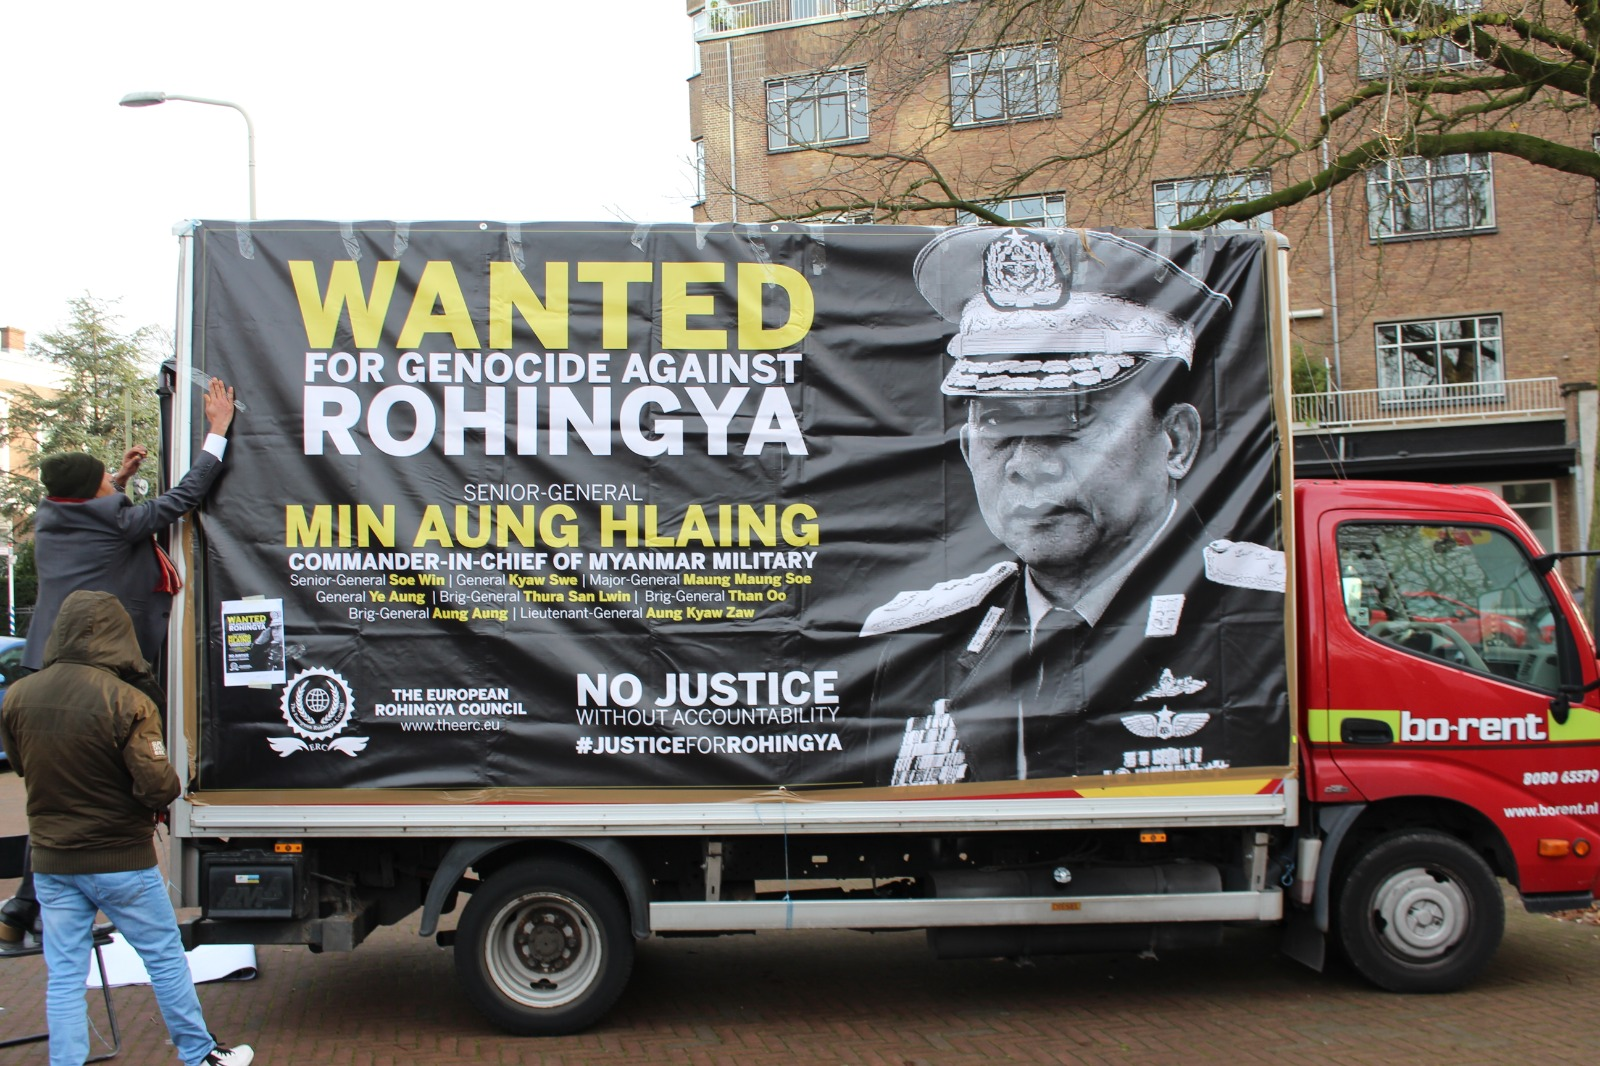 Pria Berjubah Kunyit Unggah Video Hina Muslim Rohingya dengan An***g Liar